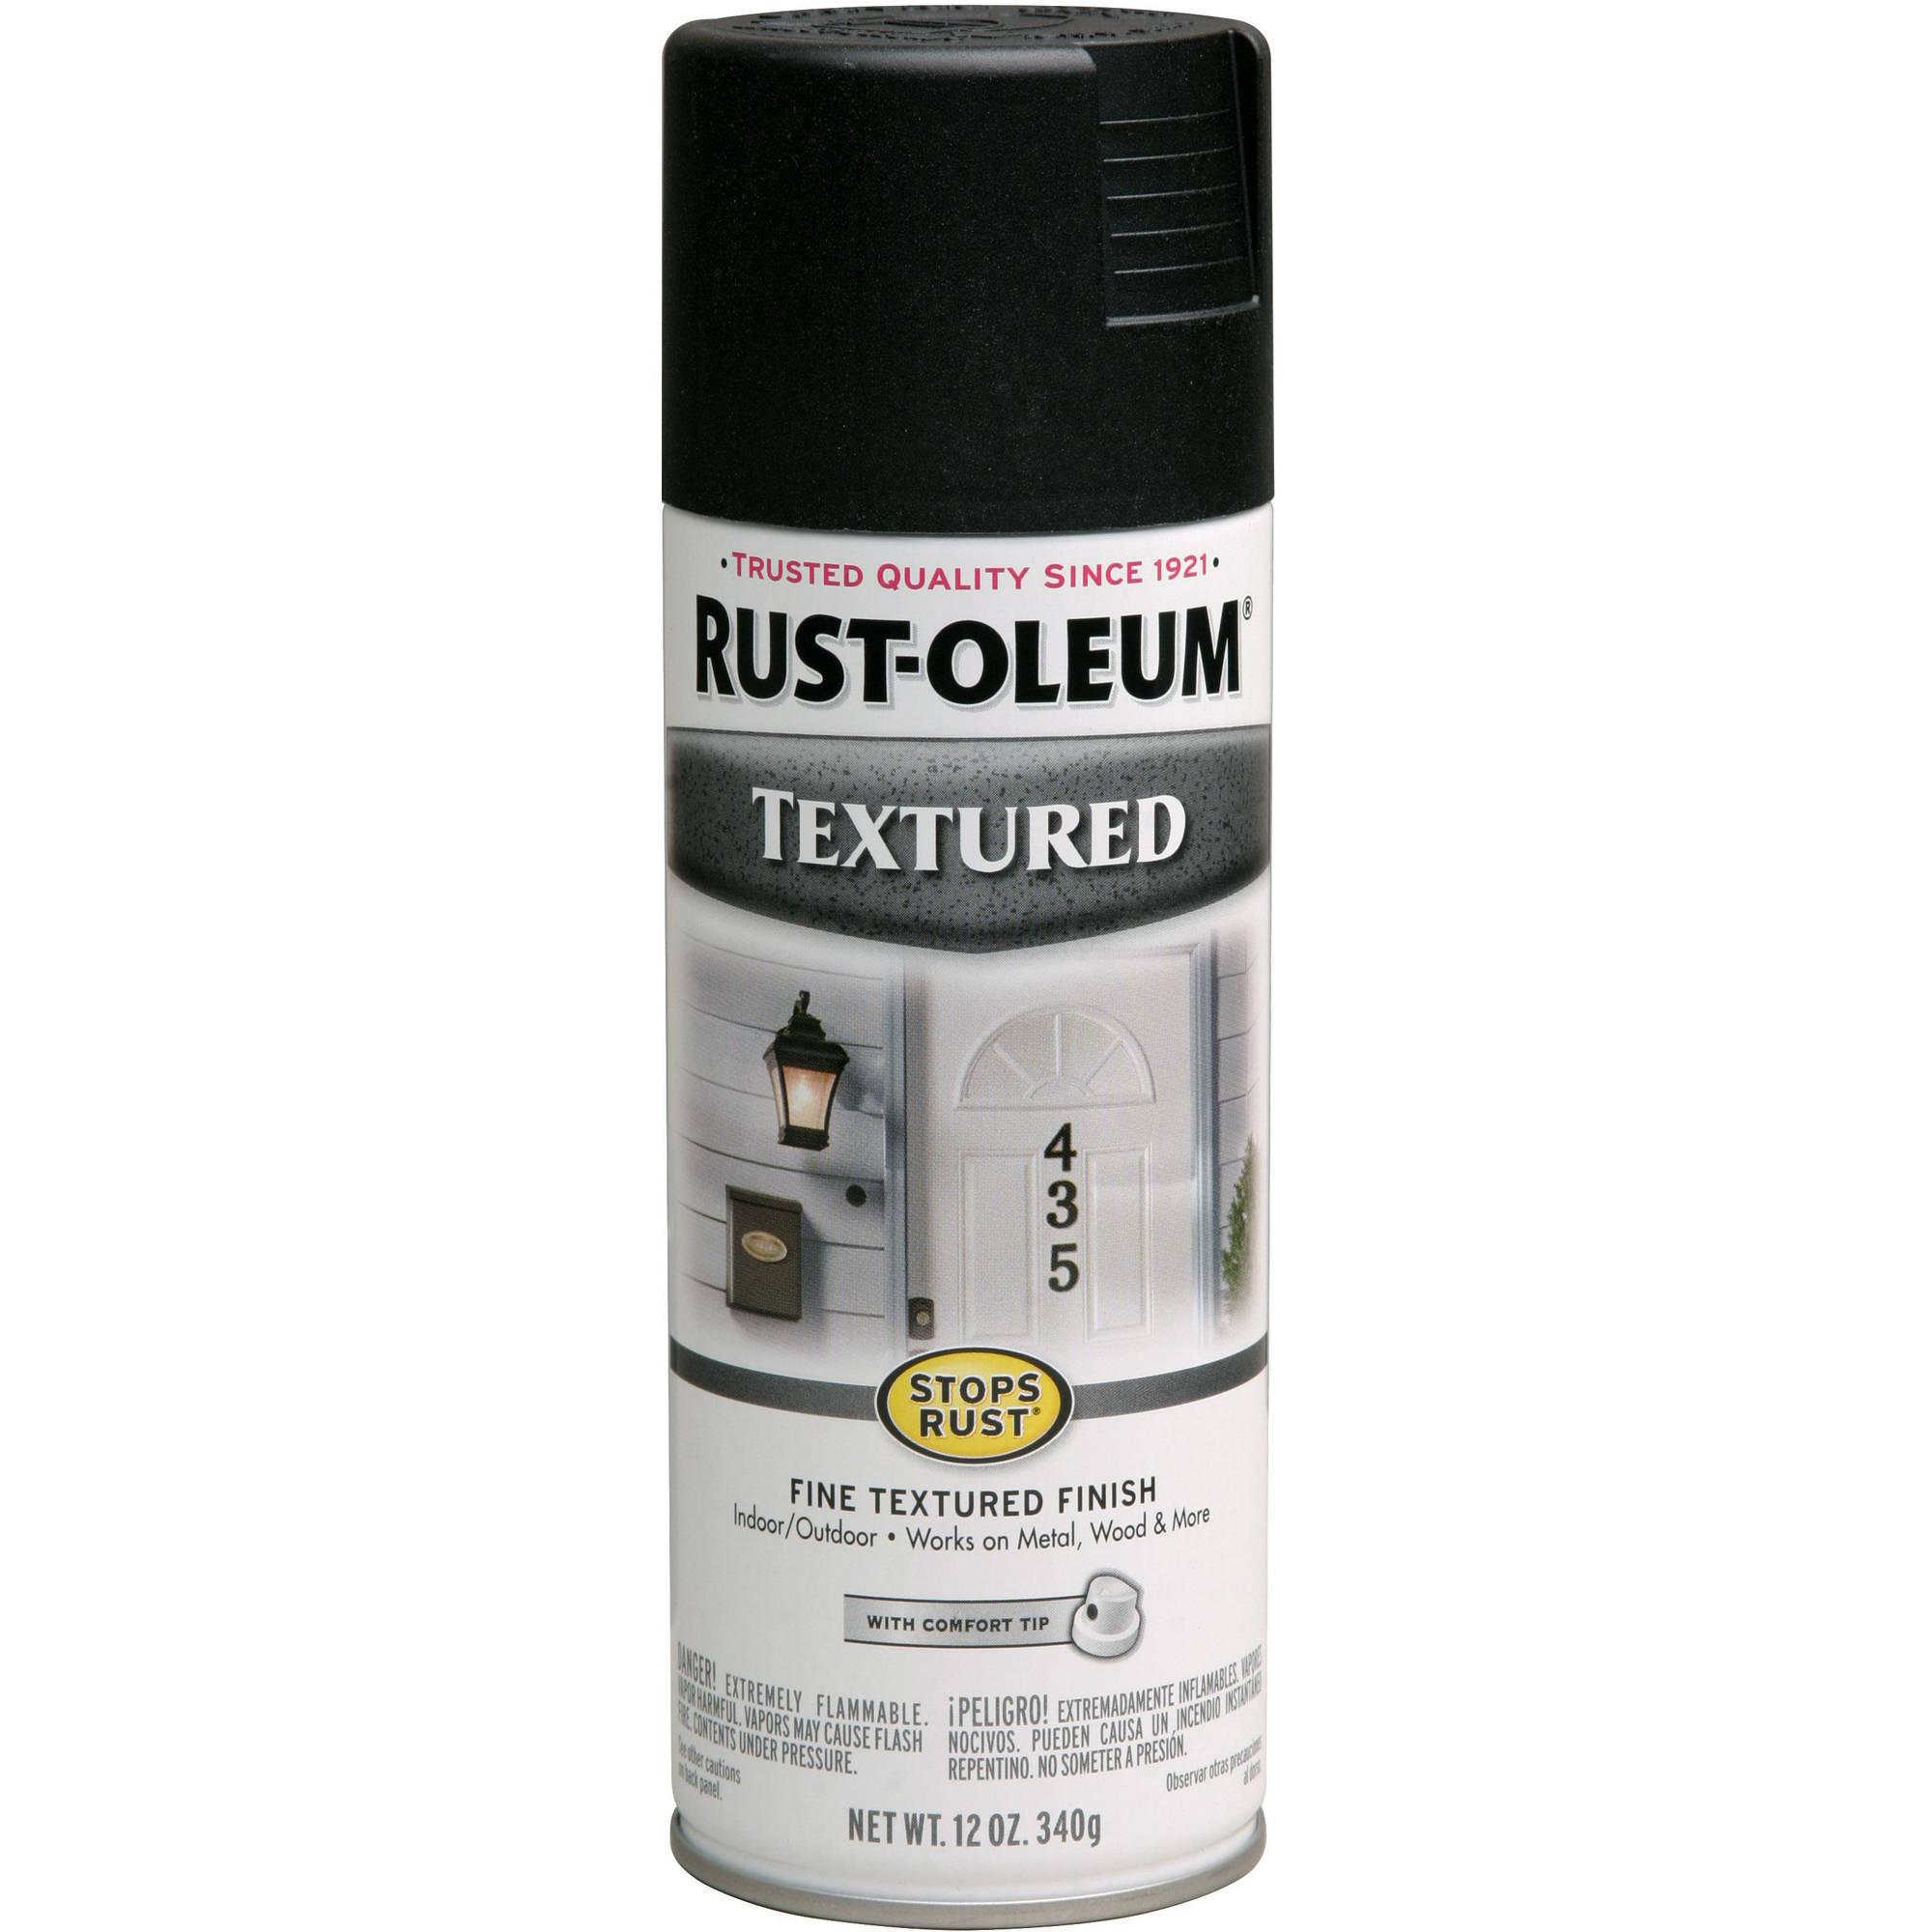 Rust-Oleum Stops Rust Textured Spray Paint